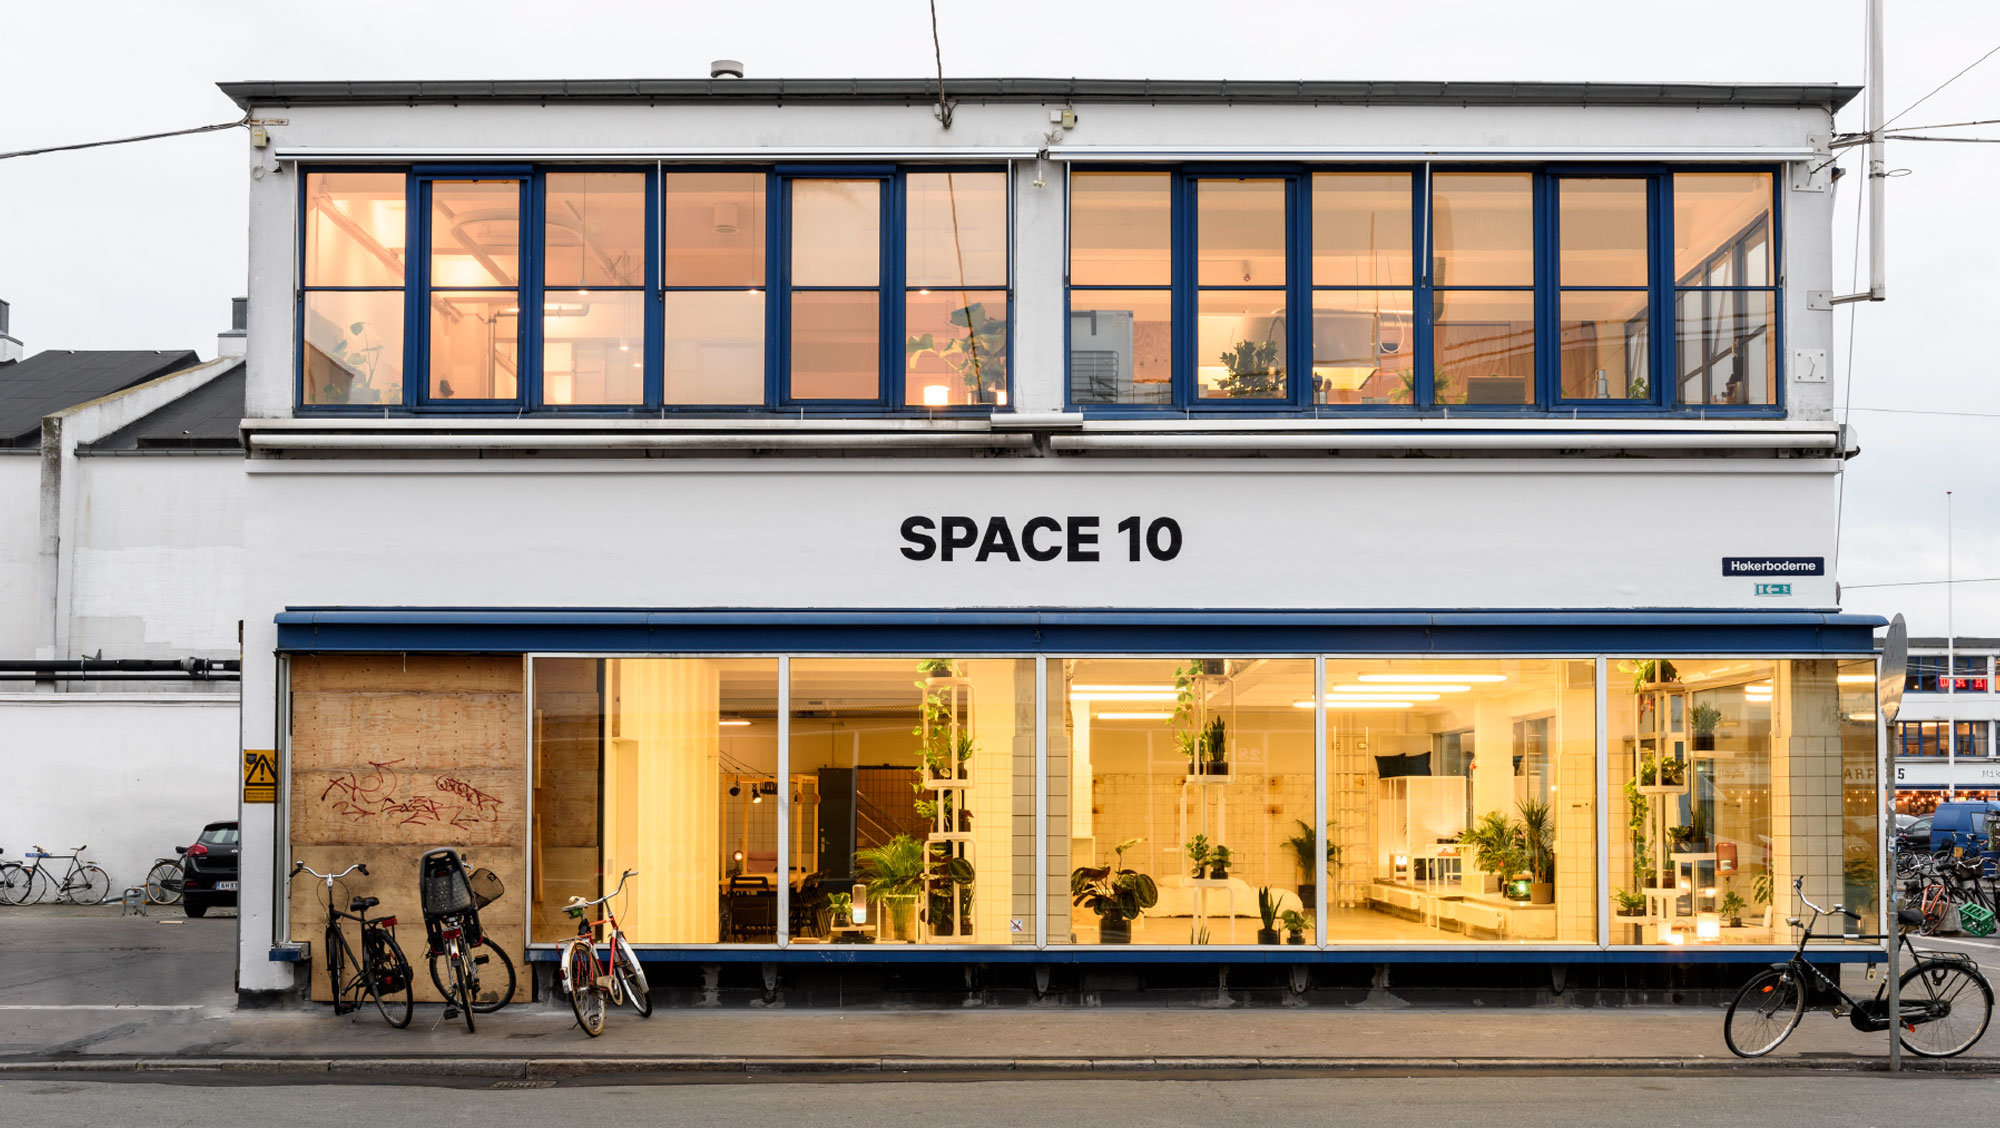 Fuhr_Studio_Design_og_branding_bureau_Space10_Visuel_Identitet_04.jpg